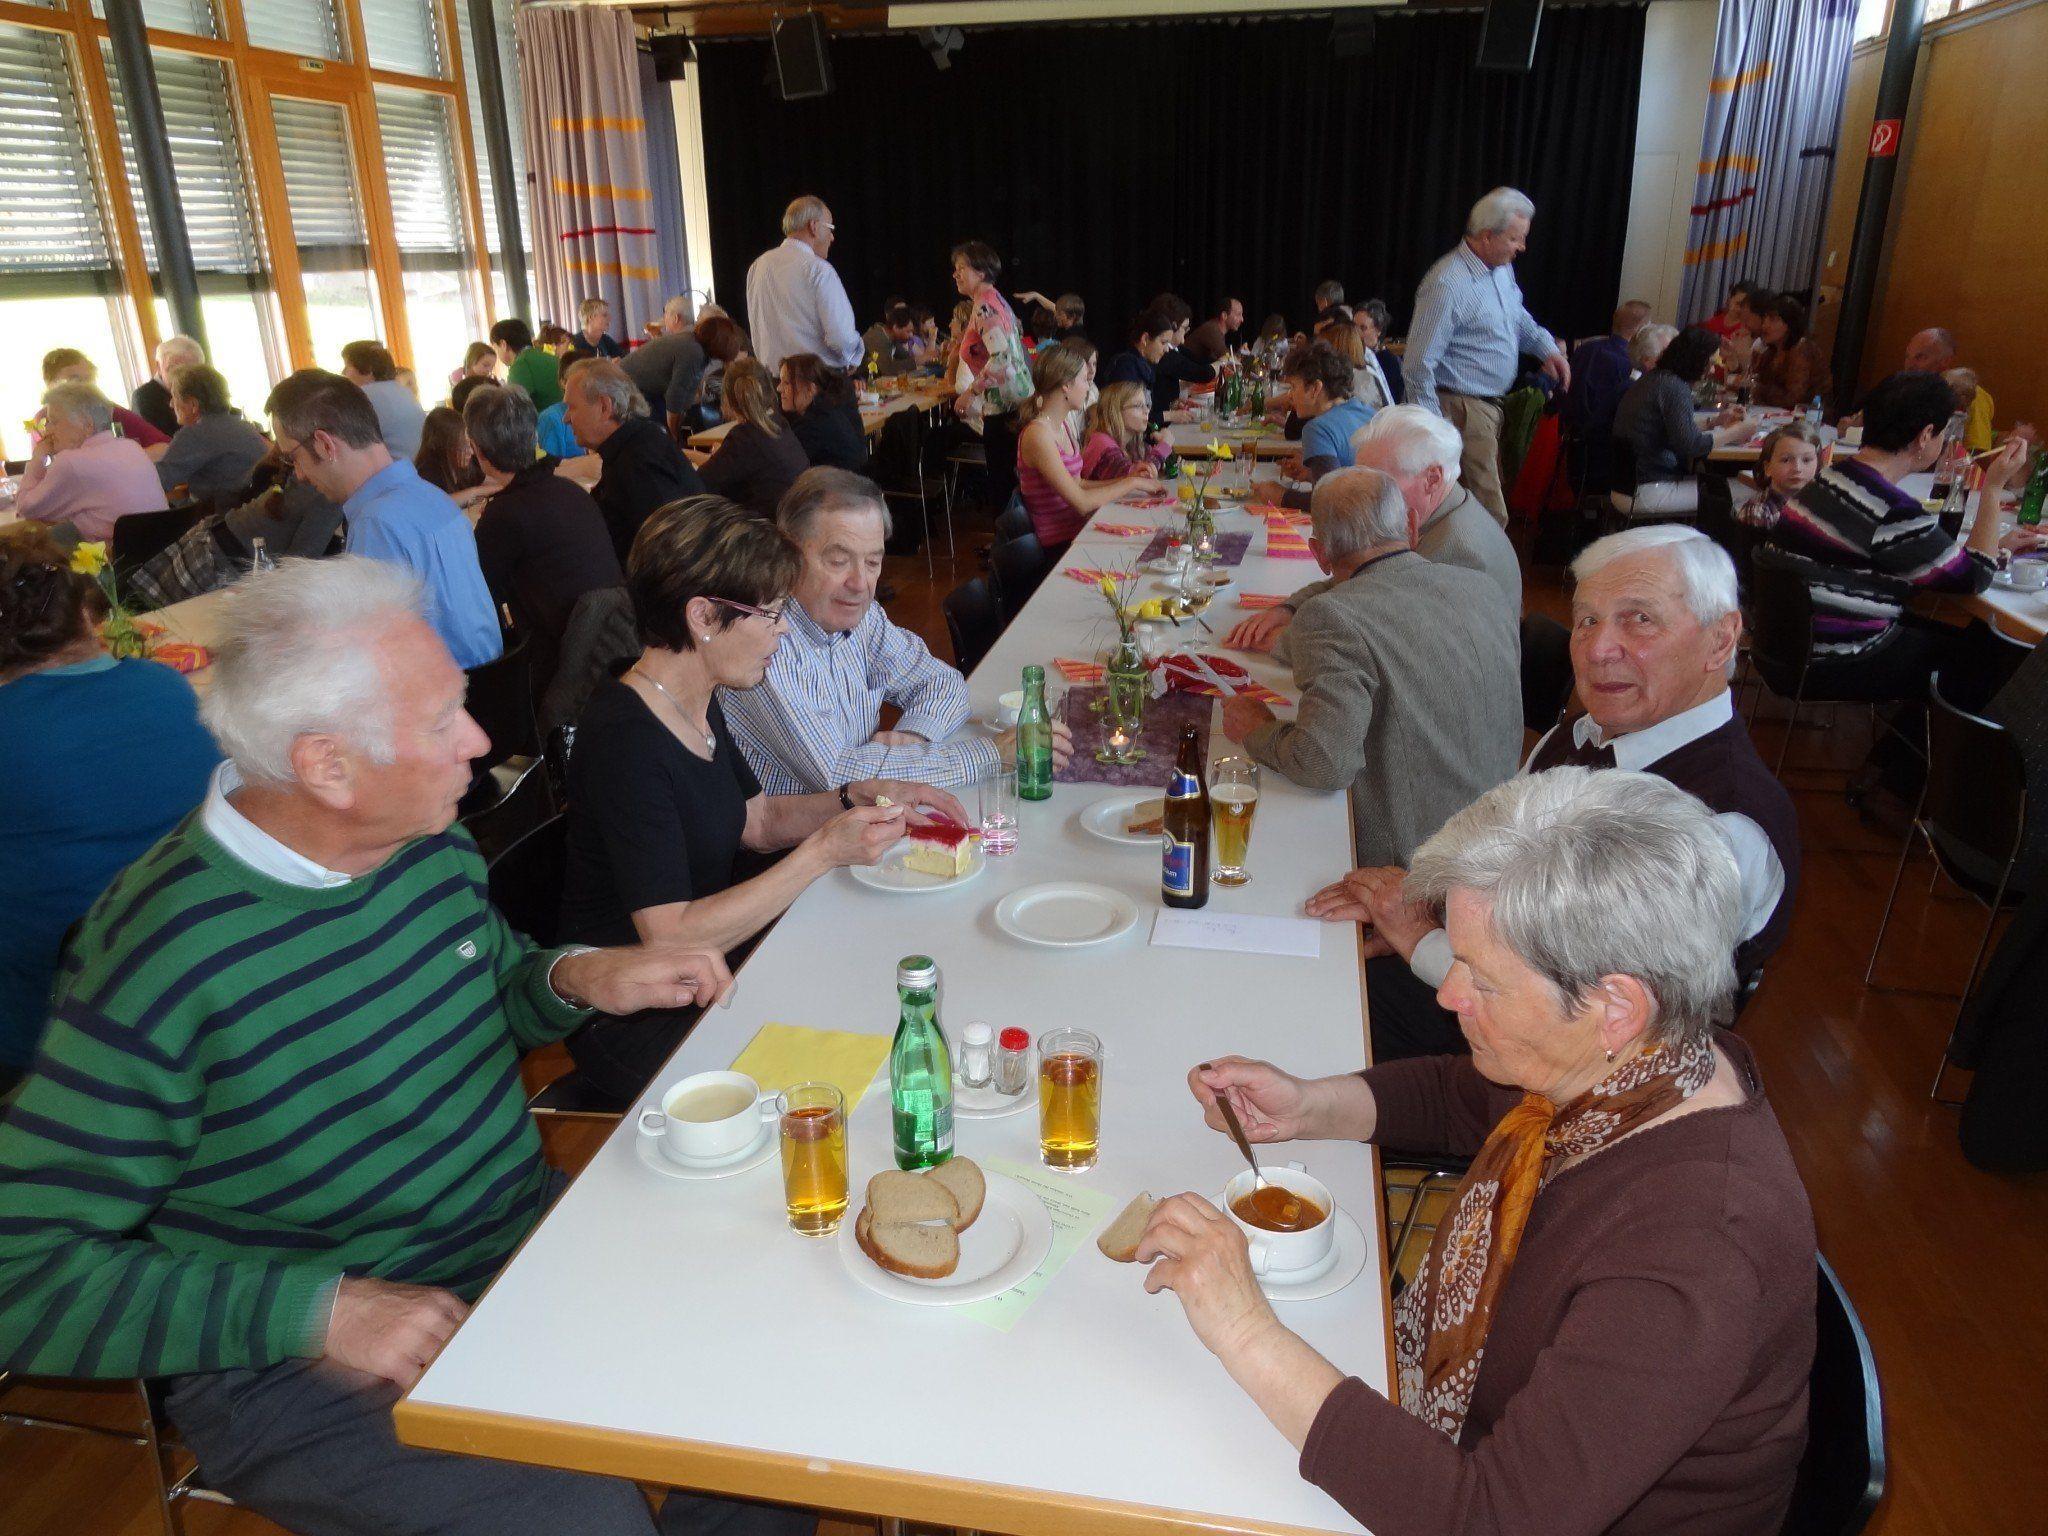 Sie Sucht Freundschaft Nenzing Am - Single Bar Friedberg In